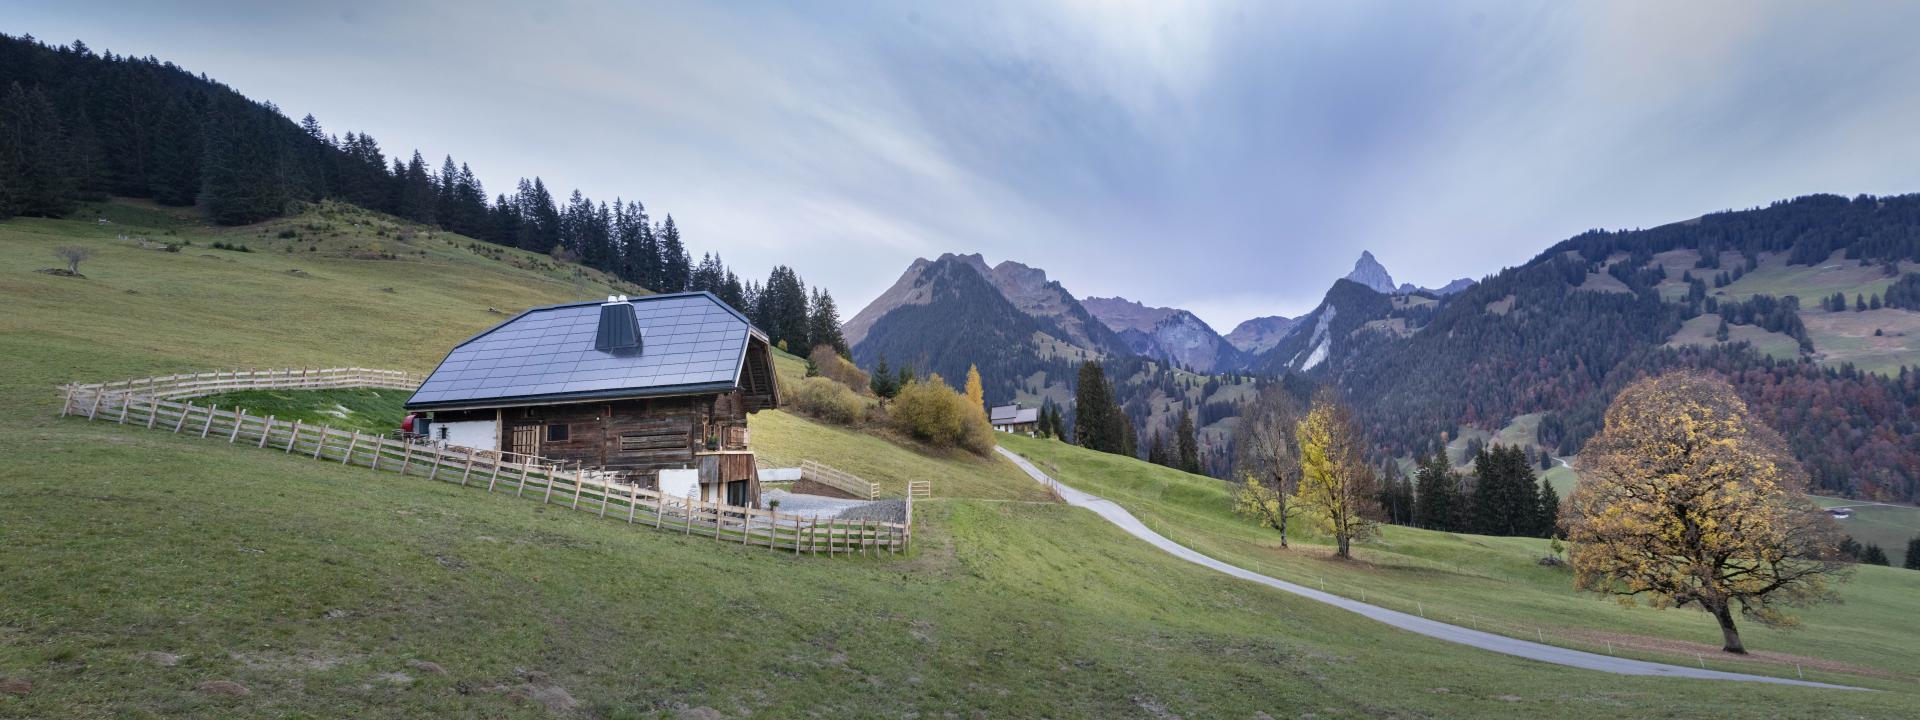 154%-PlusEnergie-EFH Sanierung, Gstaad/BE